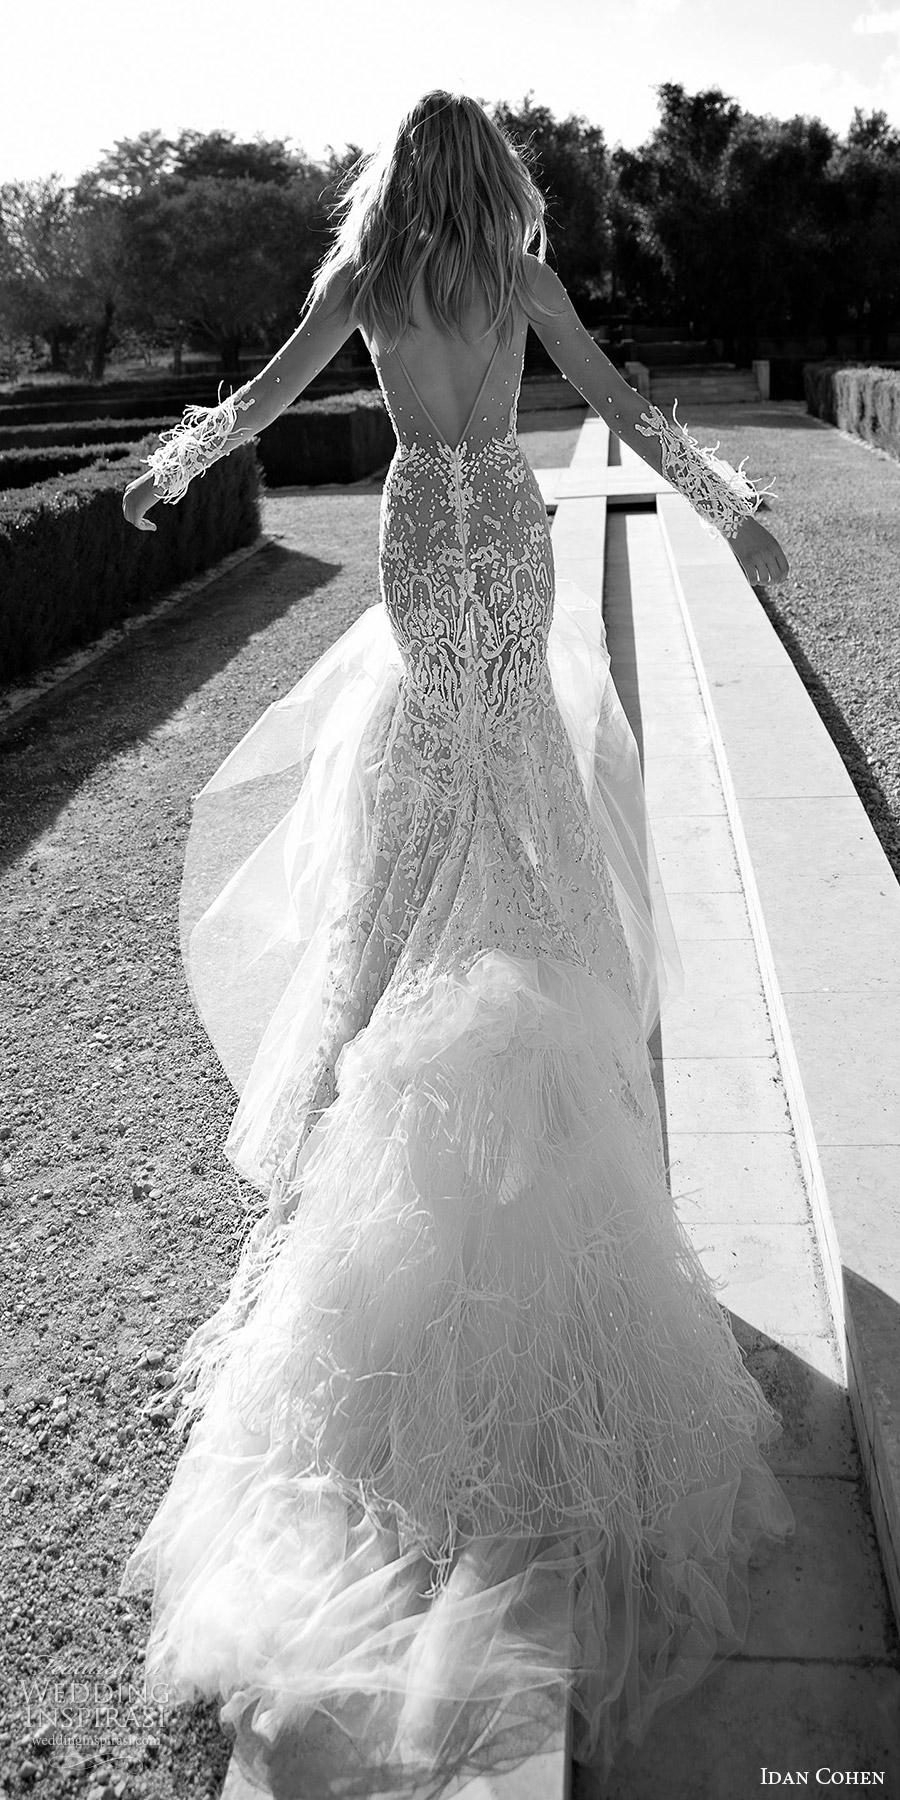 Idan Cohen de novia 2017 mangas largas ilusión del amor del cordón vestido de novia trompeta (Carolina) bv tren vback pluma